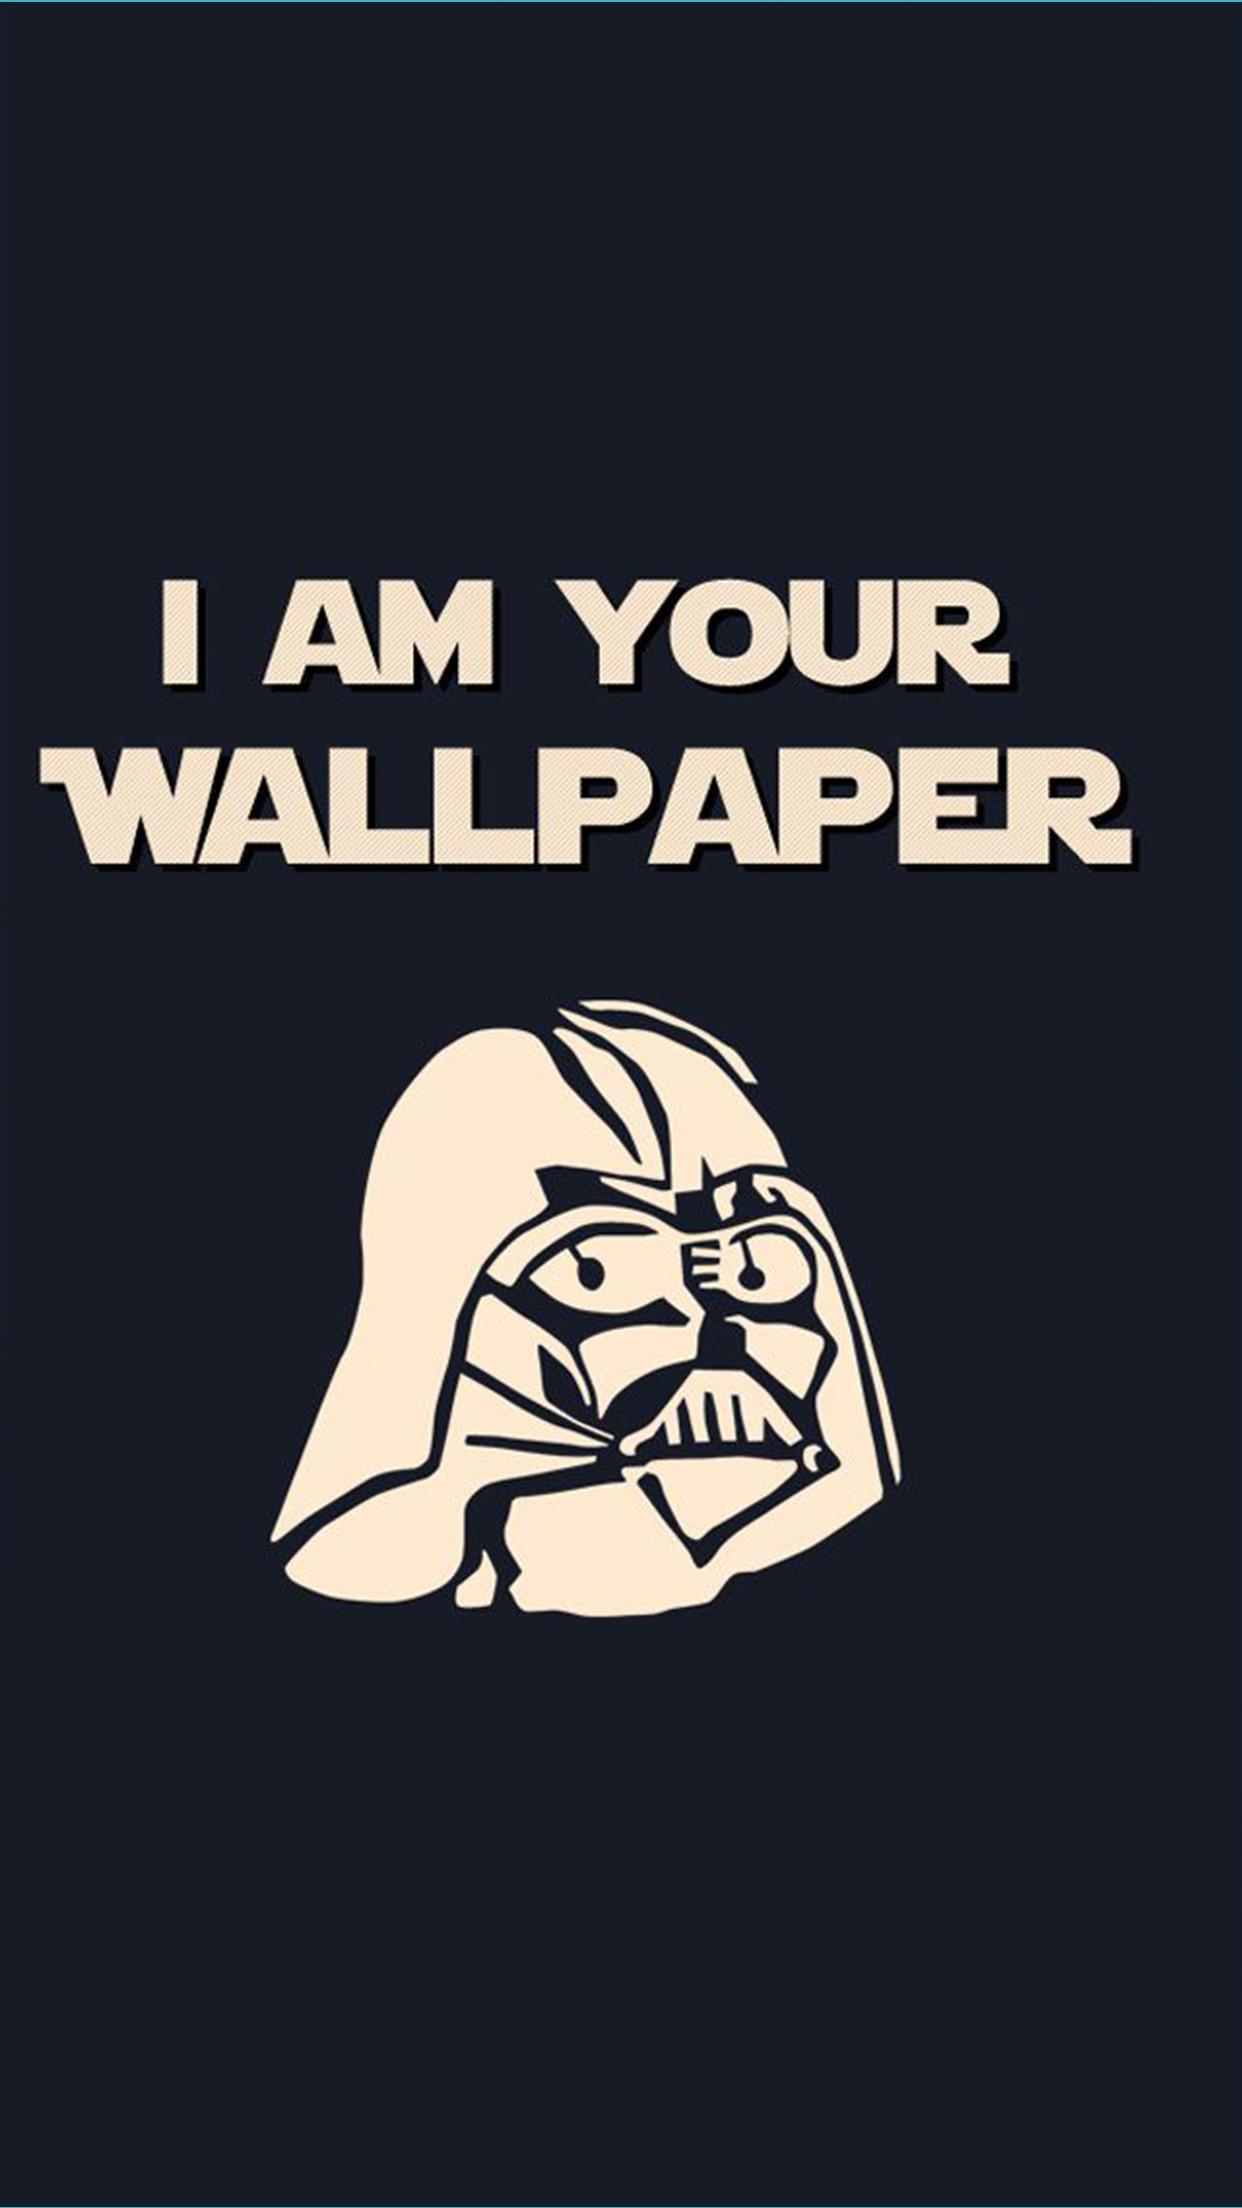 Funny Stupid Wallpapers Wallpapertag